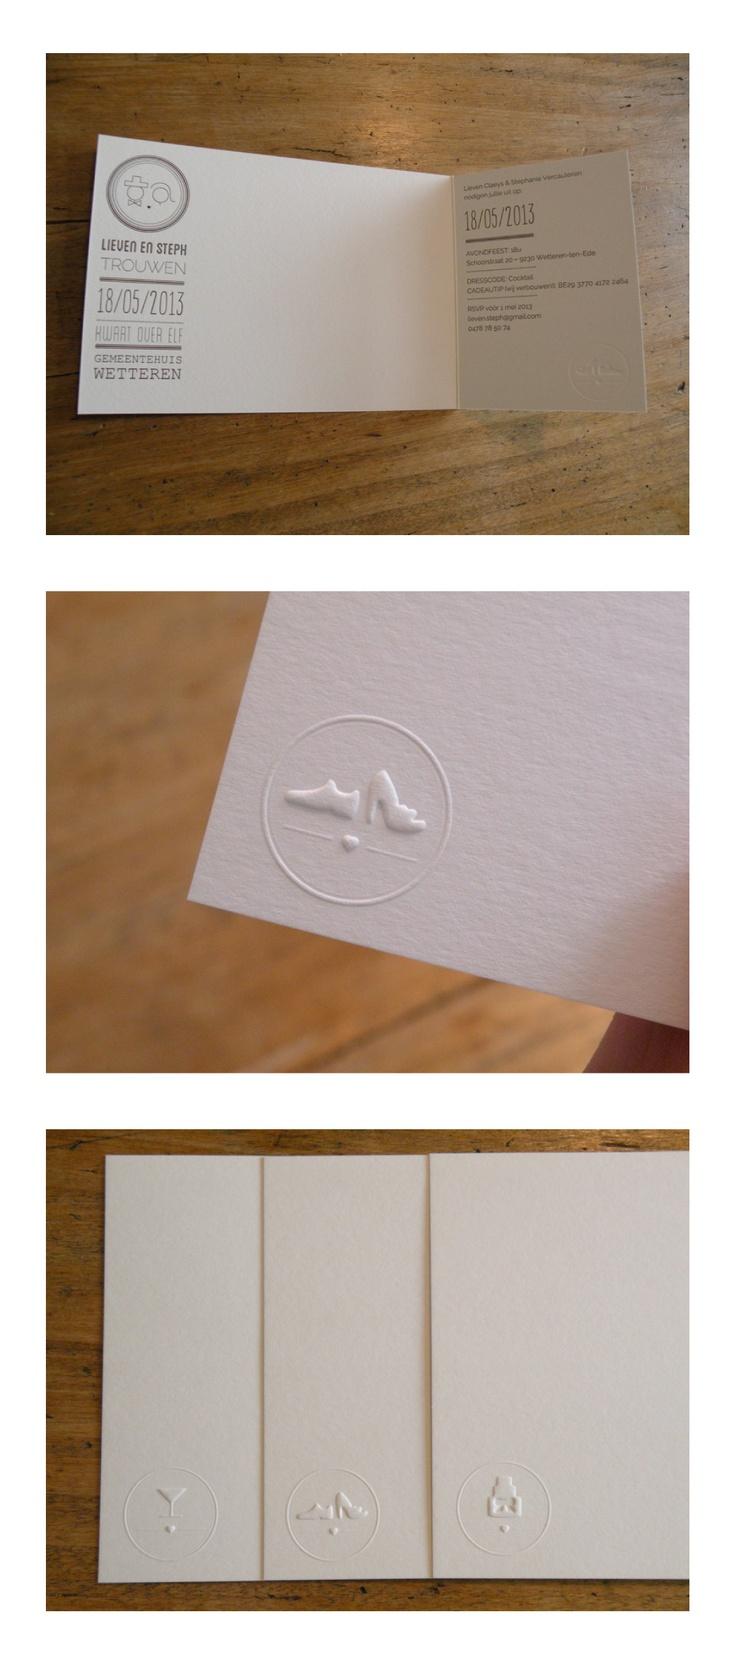 Weddinginvitation/Logo(s) - Steph+Lieven